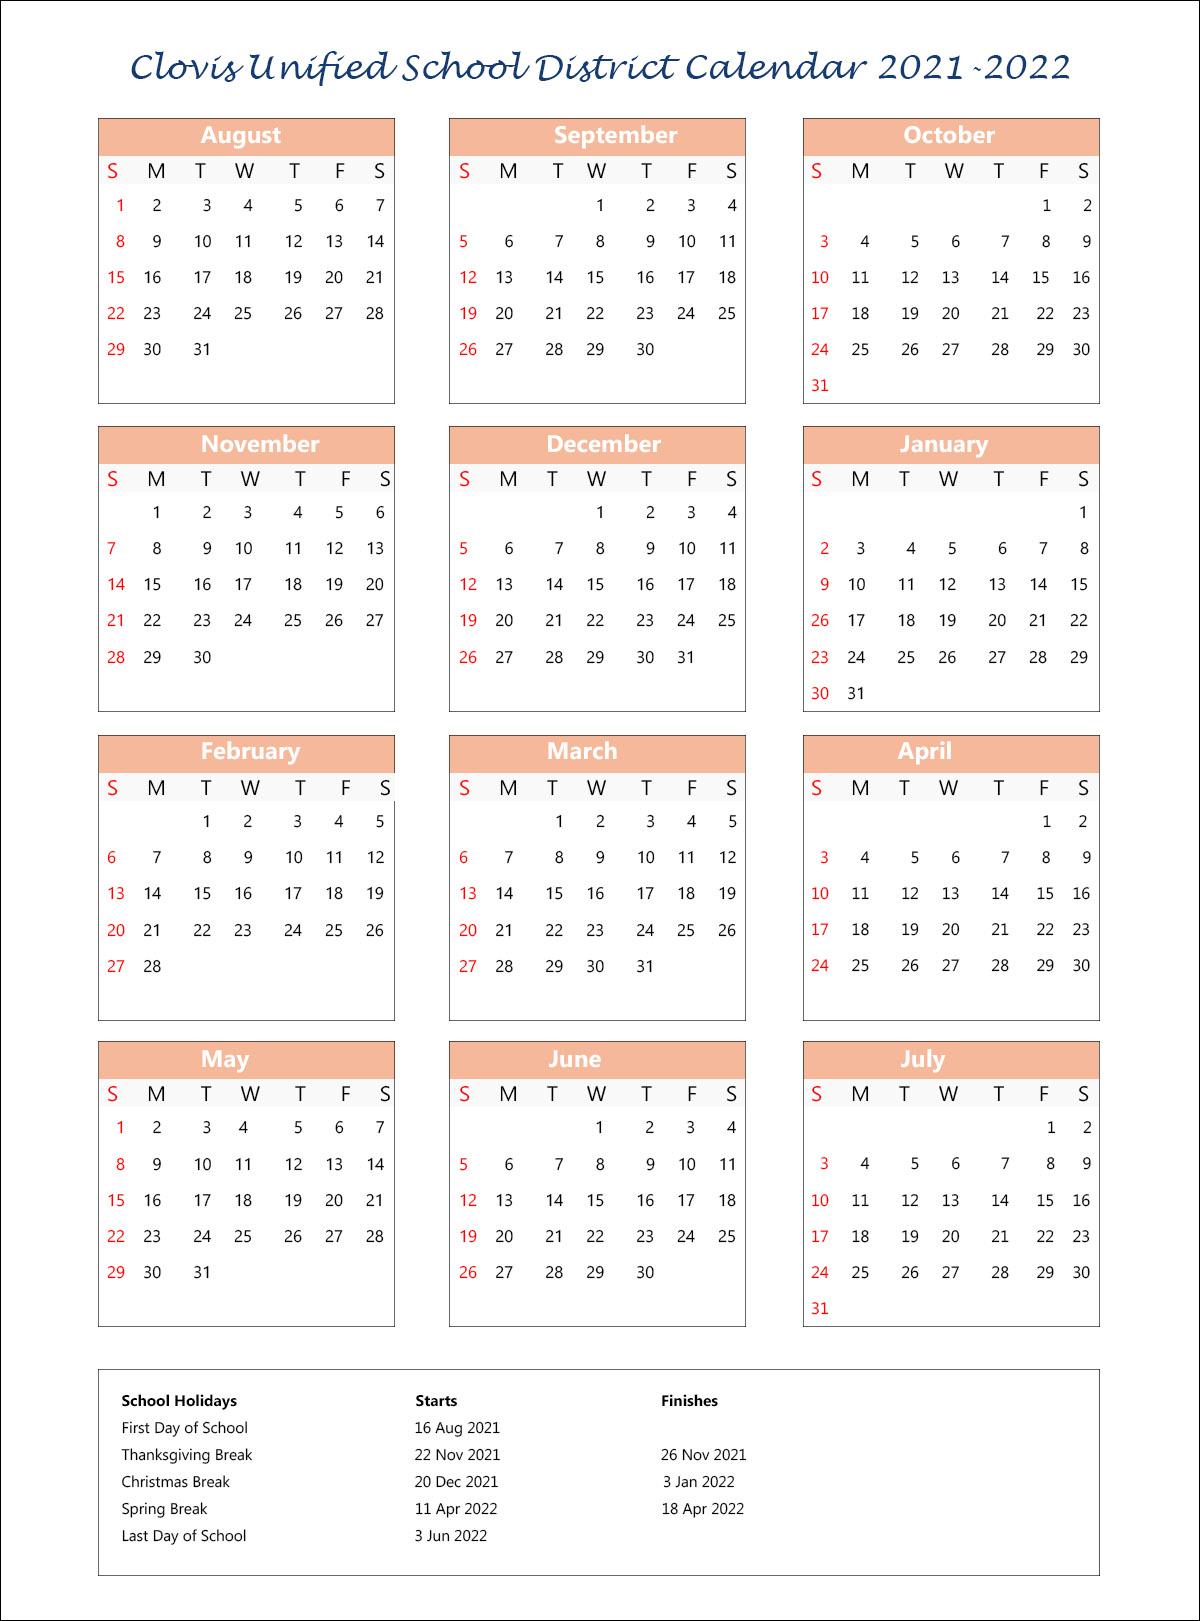 Cusd Calendar 2022.Clovis Unified School District Calendar Holidays 2021 2022